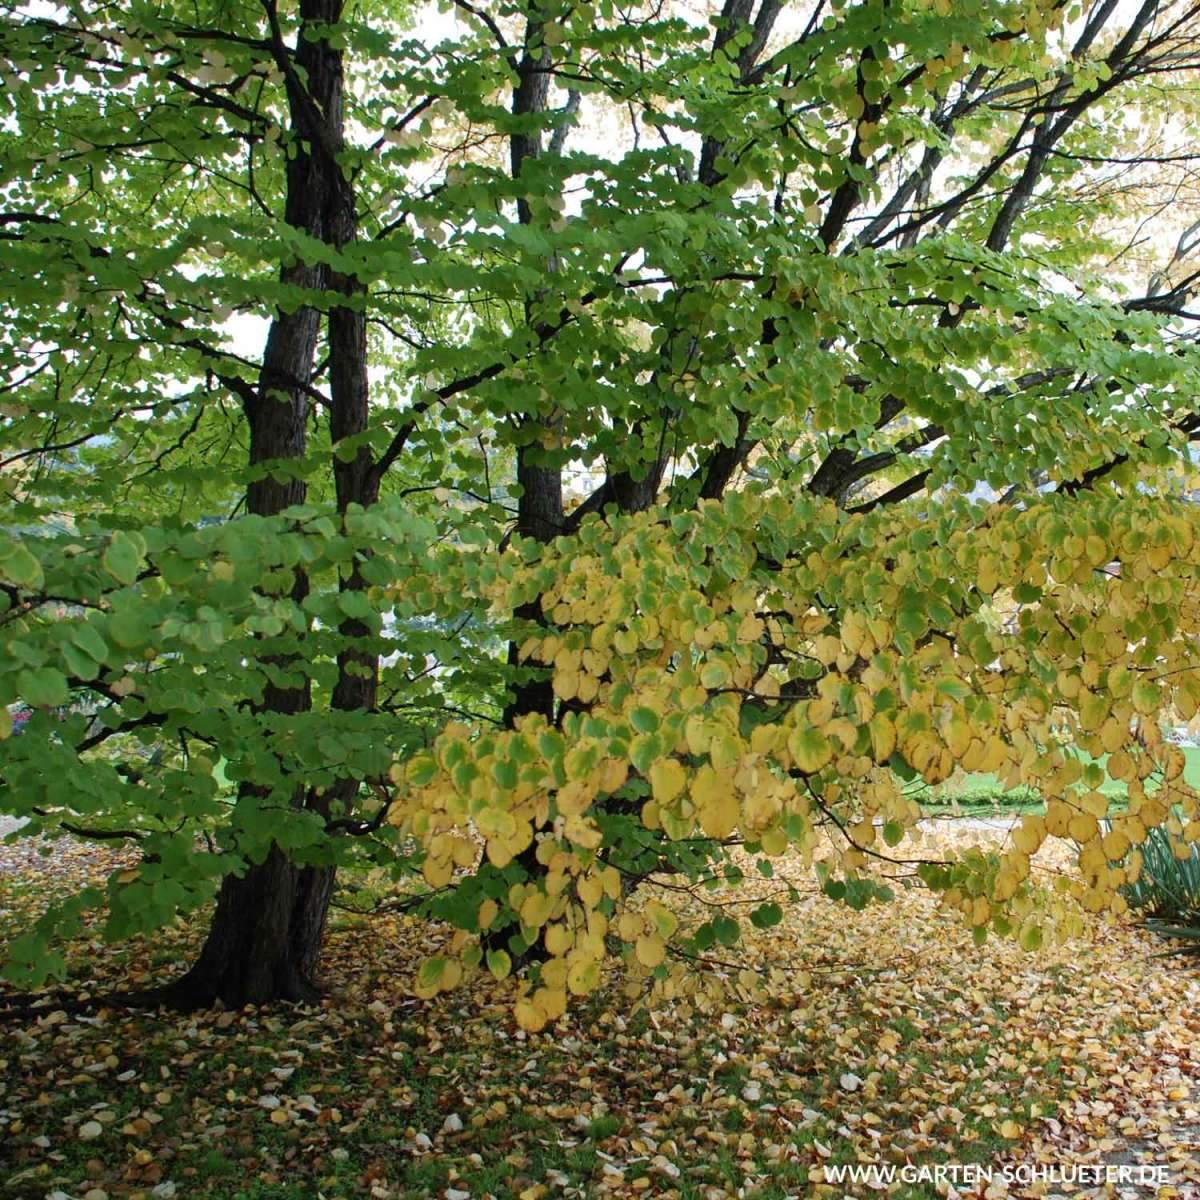 1 Lebkuchenbaum Kuchenbaum Katsurabaum Judasblattbaum Cercidiphyllum japonicum 600x600 2x